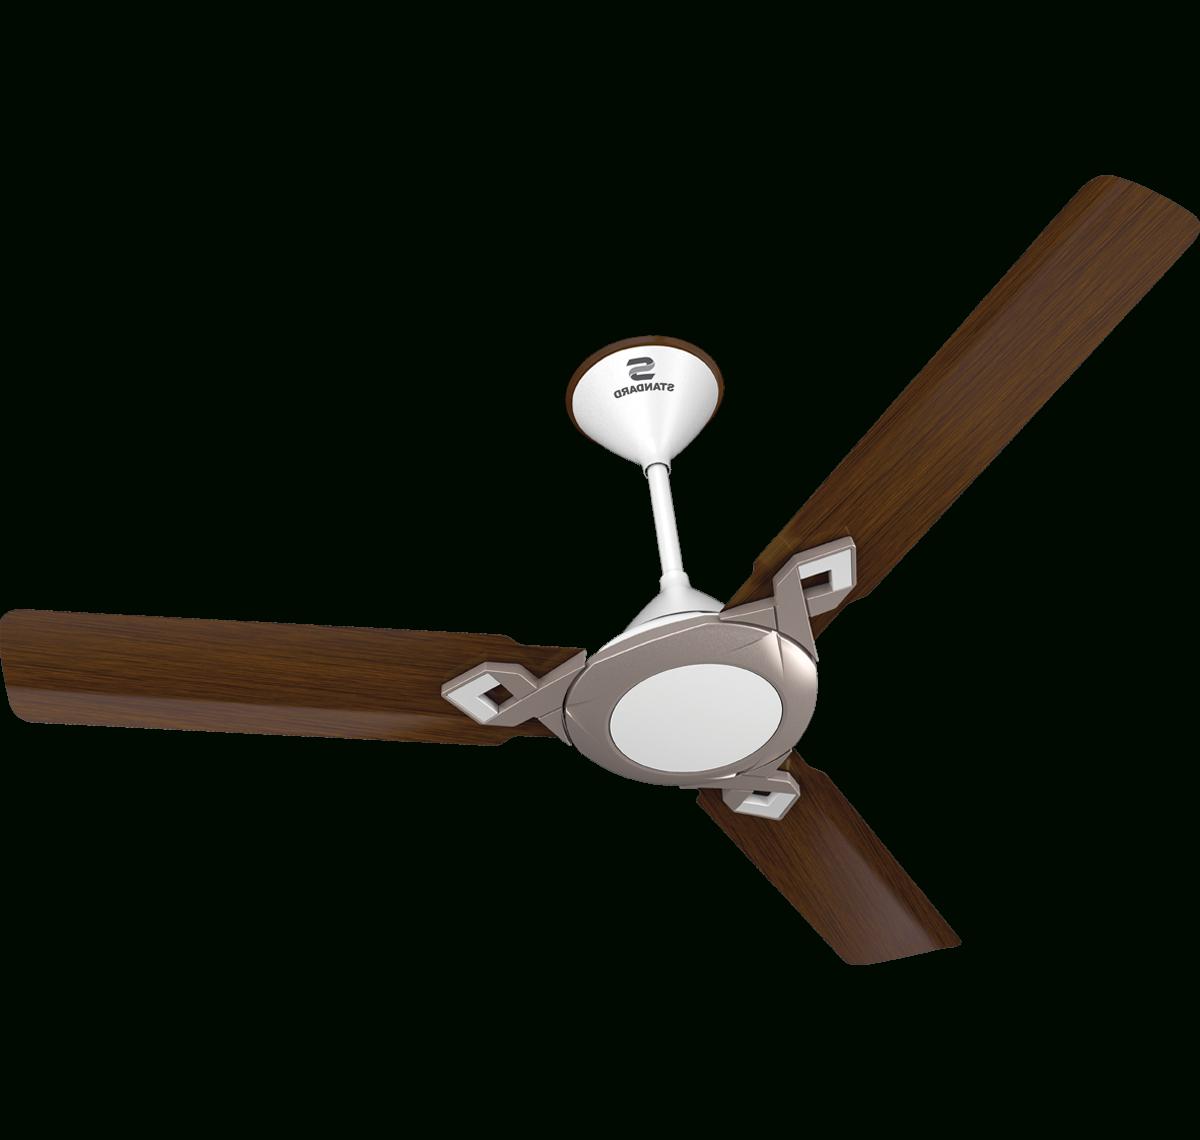 Favorite Smoak 3 Blade Ceiling Fans In High Speed Ceiling Fan – Standard Electricals (View 8 of 20)